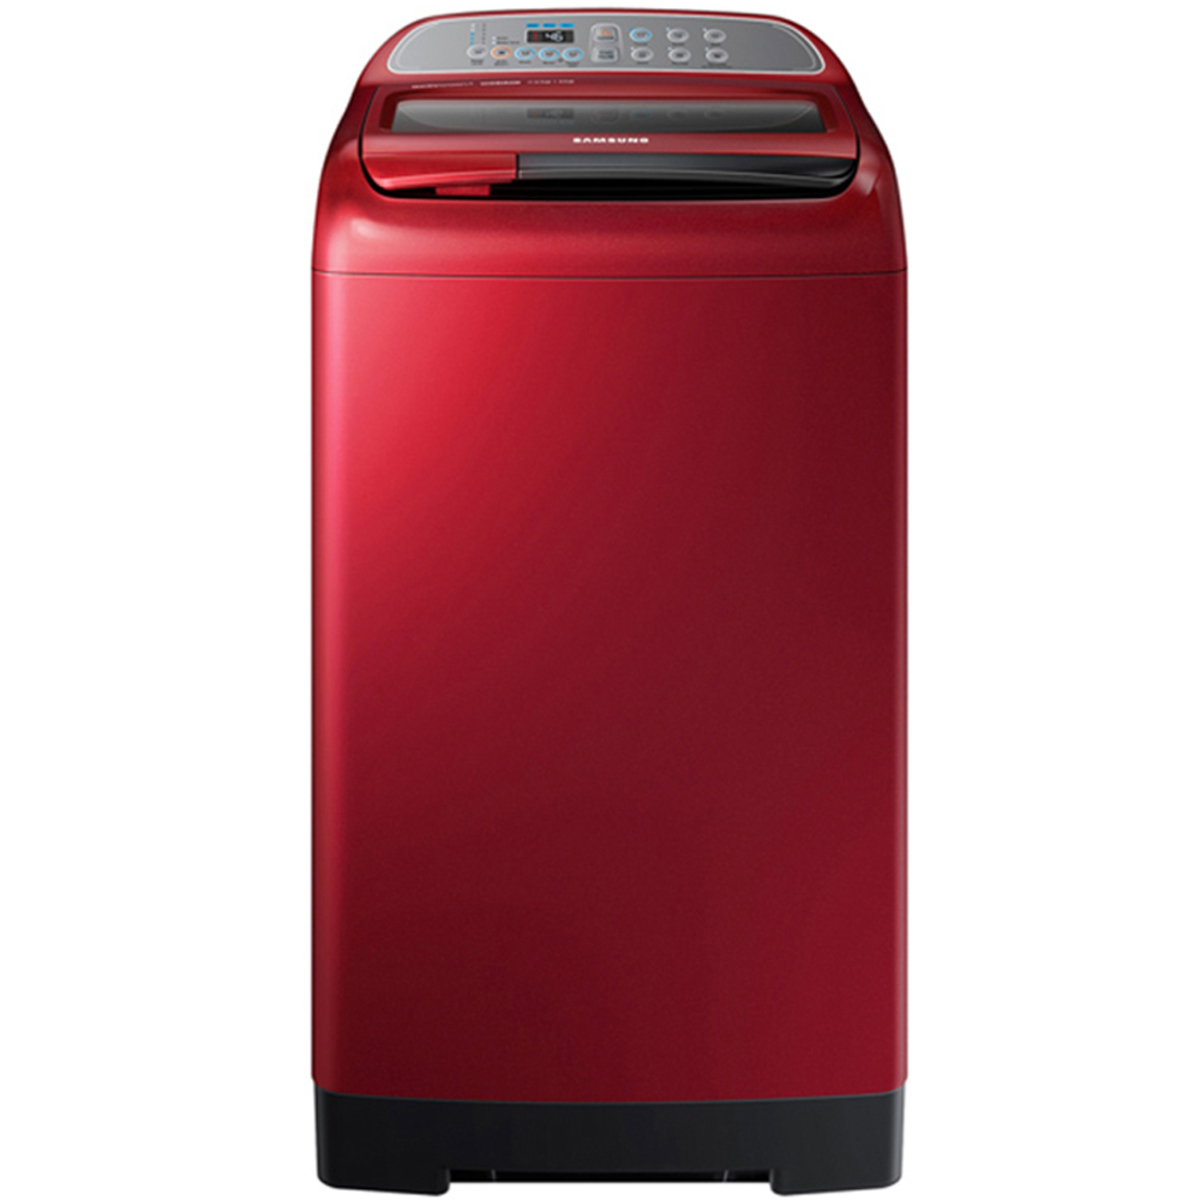 Buy Samsung Top Load Washing Machine WA75H4000HP 7 5Kg - T/L